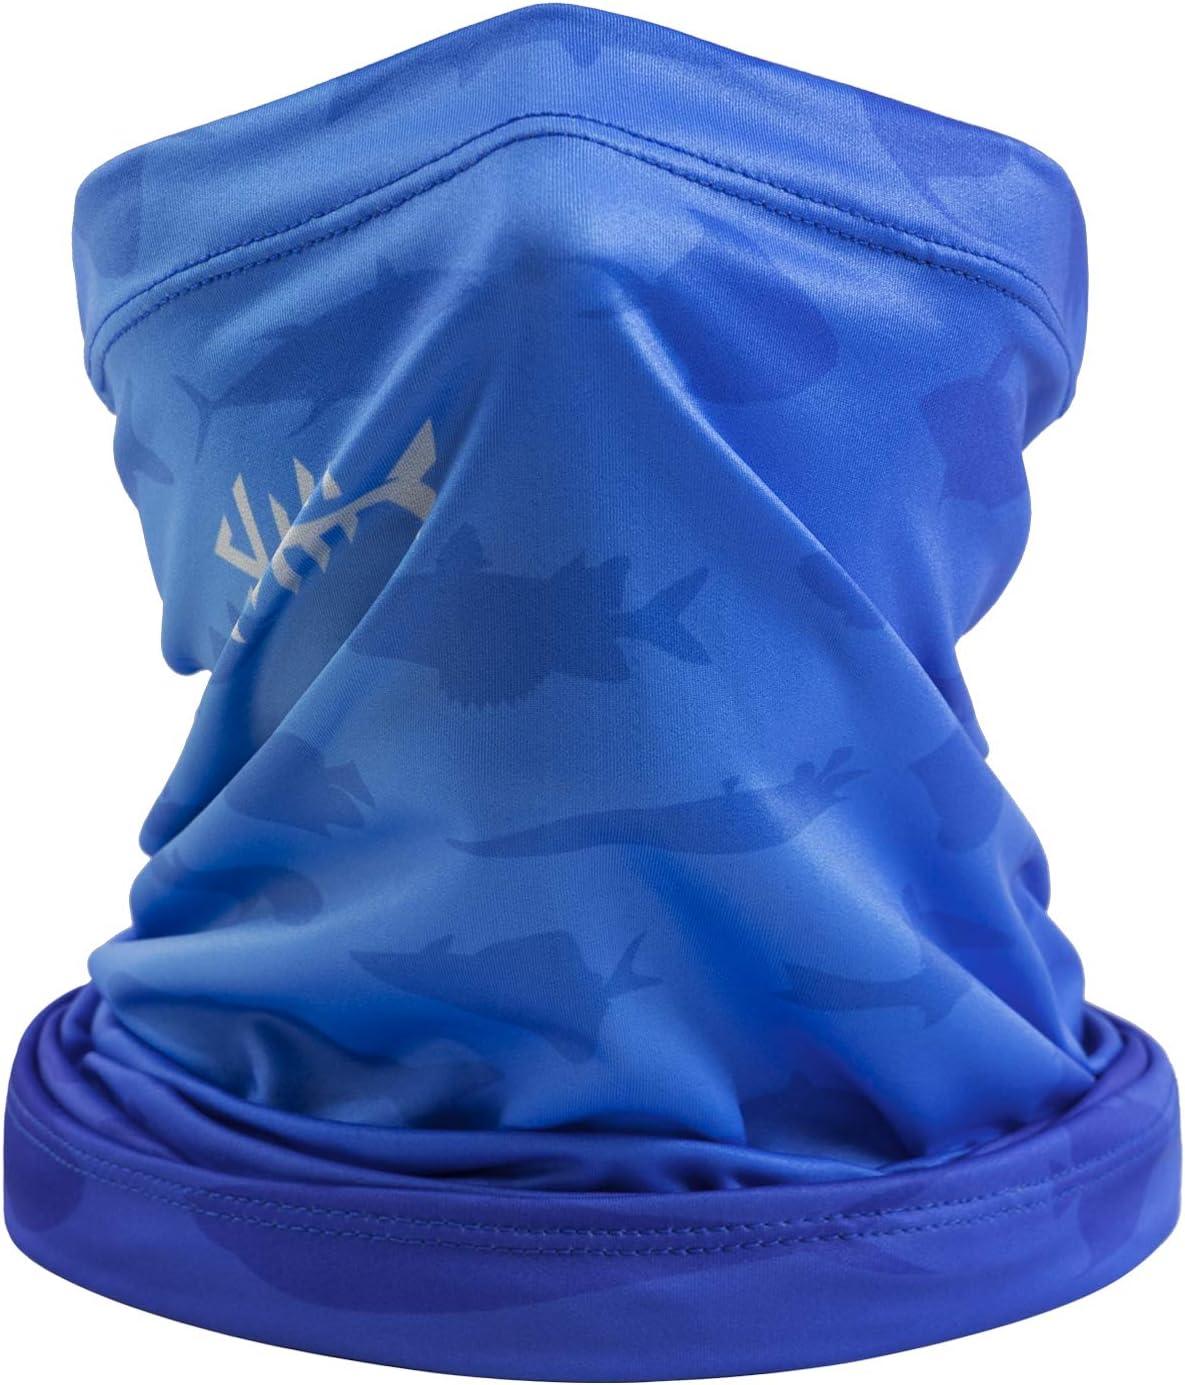 UV Protection Multi-purpose Magic scarf Elastic Headband Gaiter Balaclava for riding motorcycling hiking fishing Bassdash Neck Gaiter Headband Bandana Scarf Face Mask UPF 50